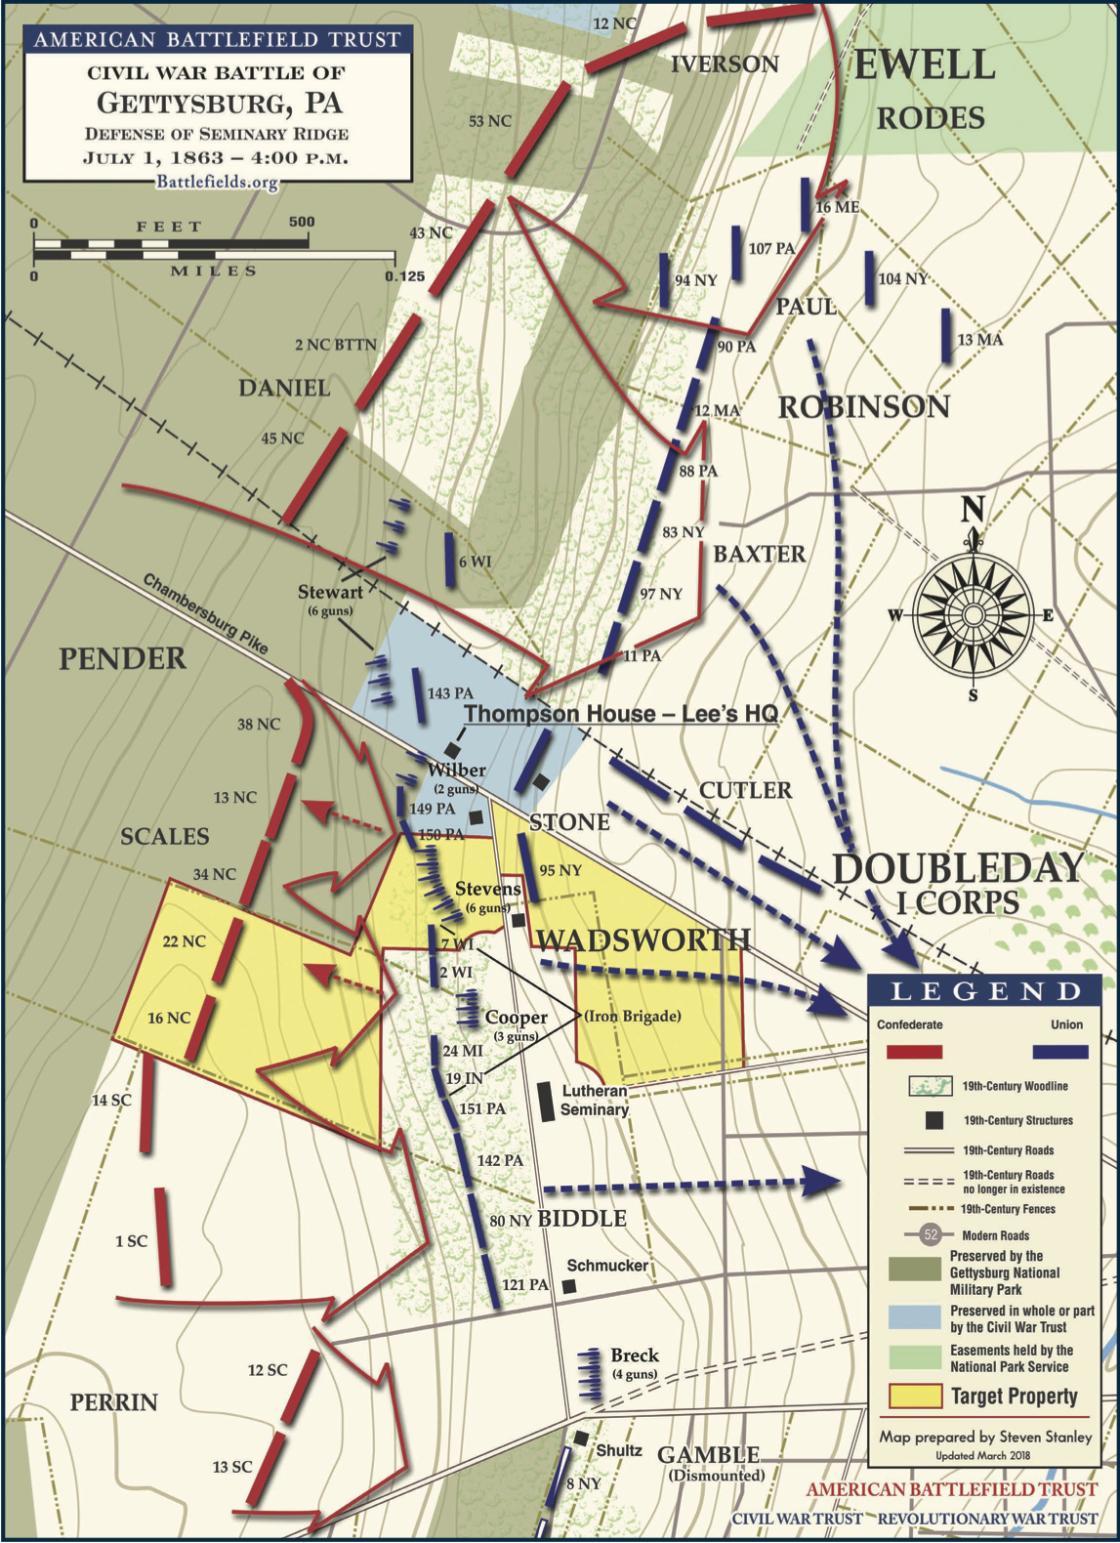 Gettysburg - Defense of Seminary Ridge, July 1, 1863 - 4:00 pm (May 2018)